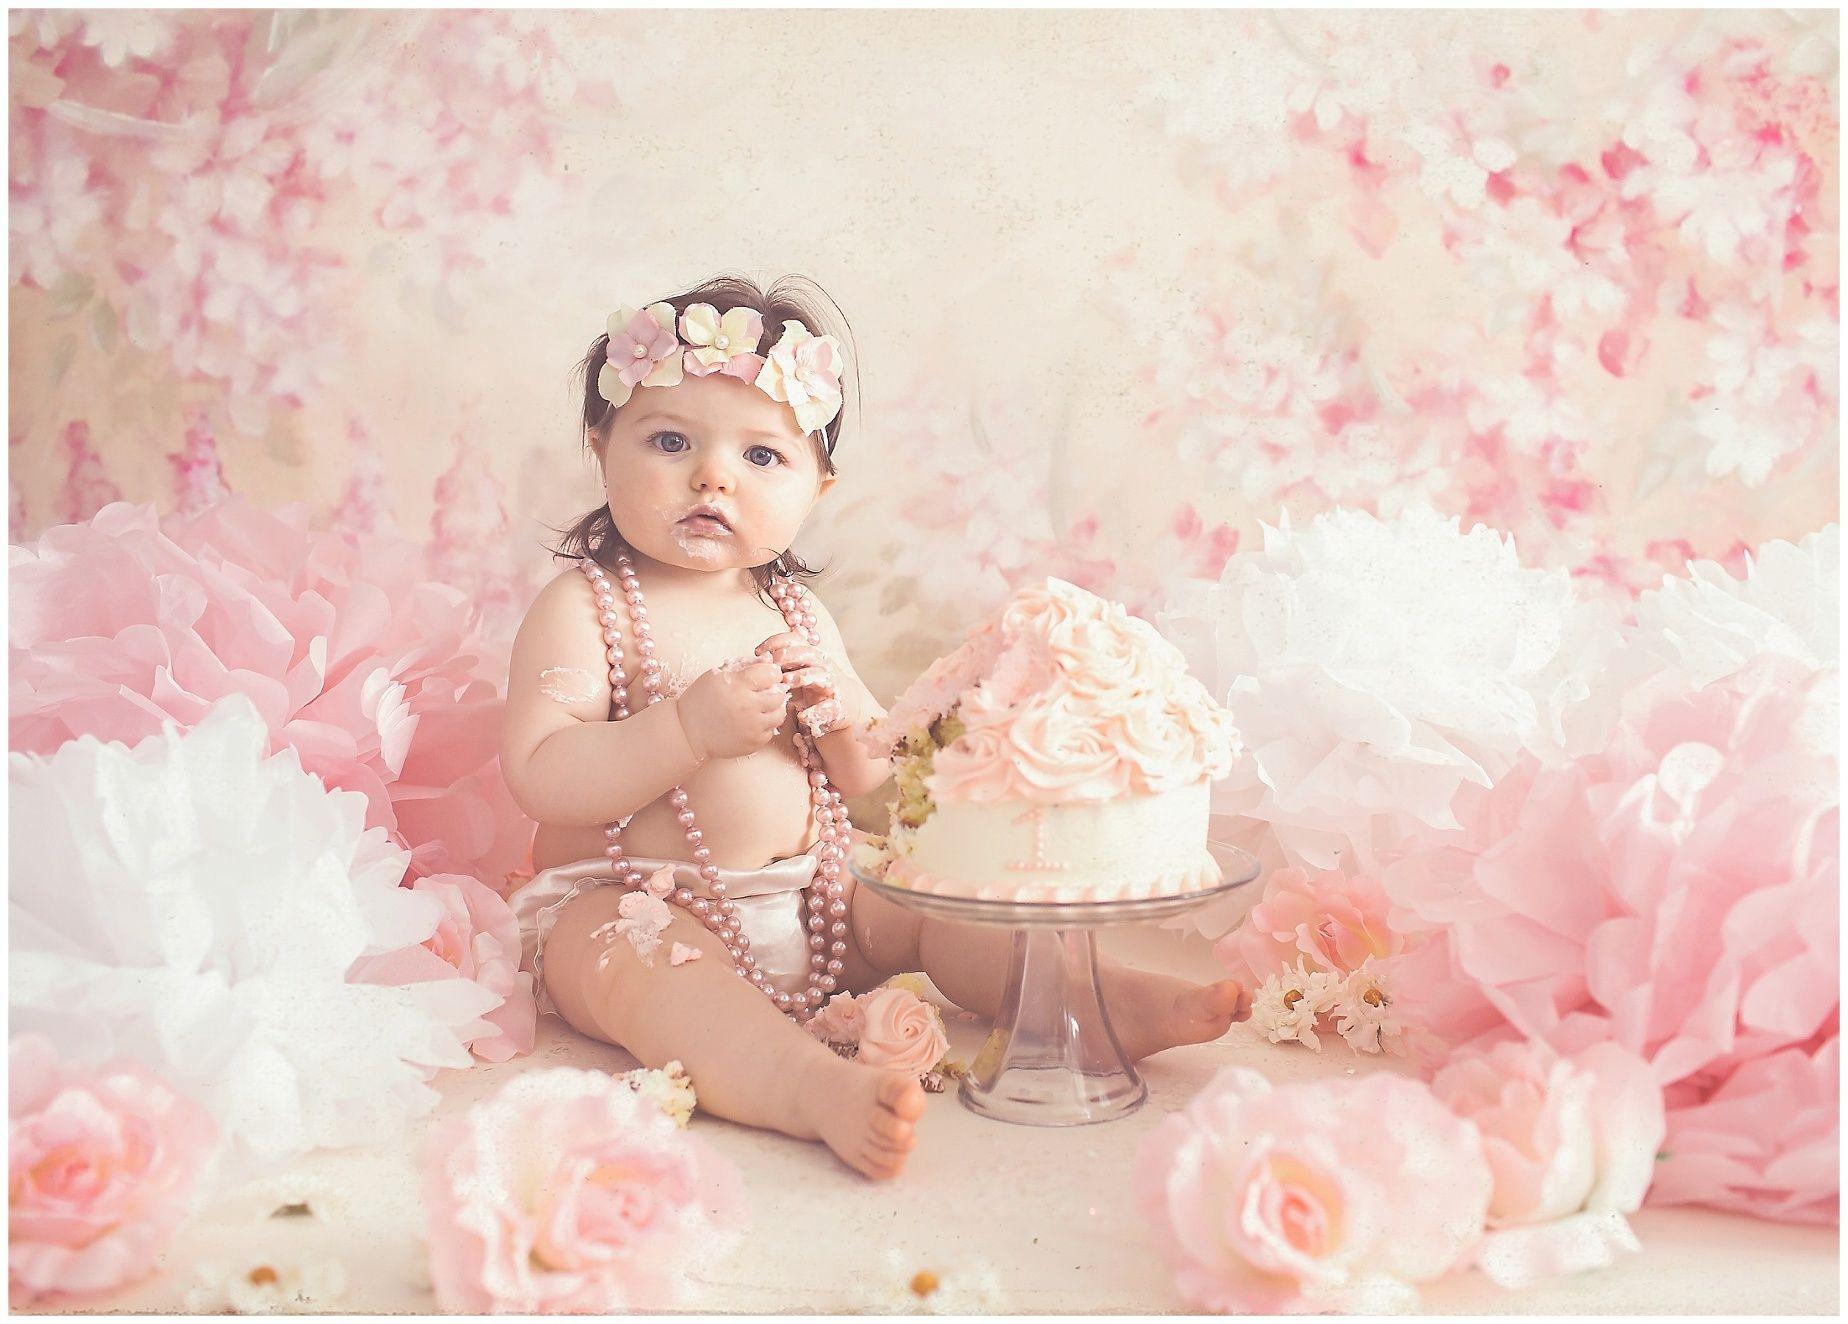 Vintage, girly, rose flower themed cake smash photography